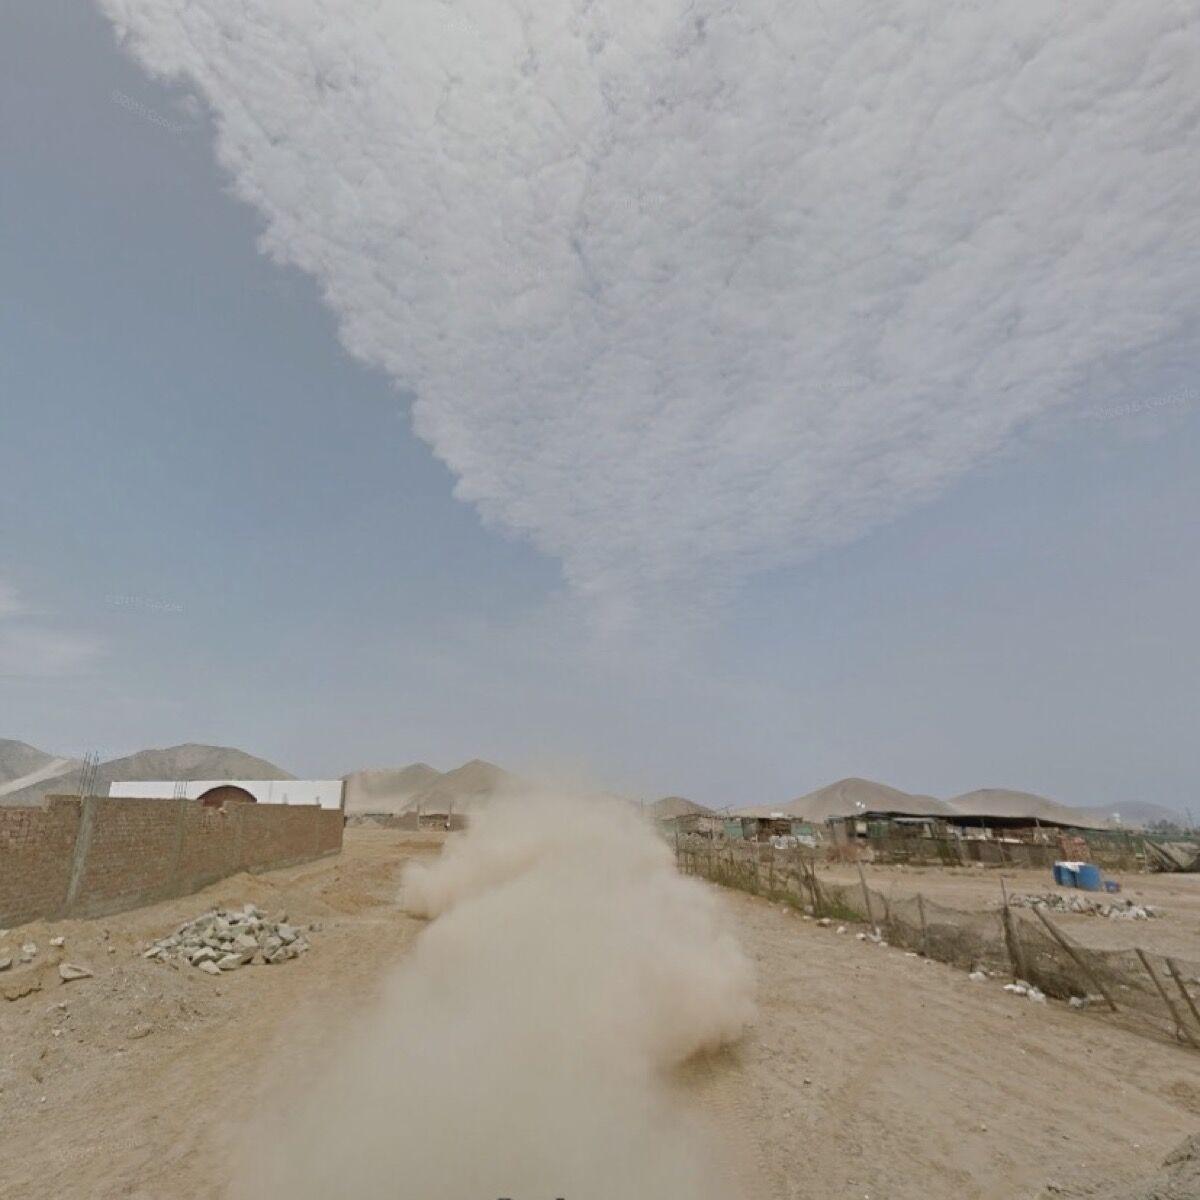 Lima Region, Peru. Photograph by Jacqui Kenny via Google Street View.